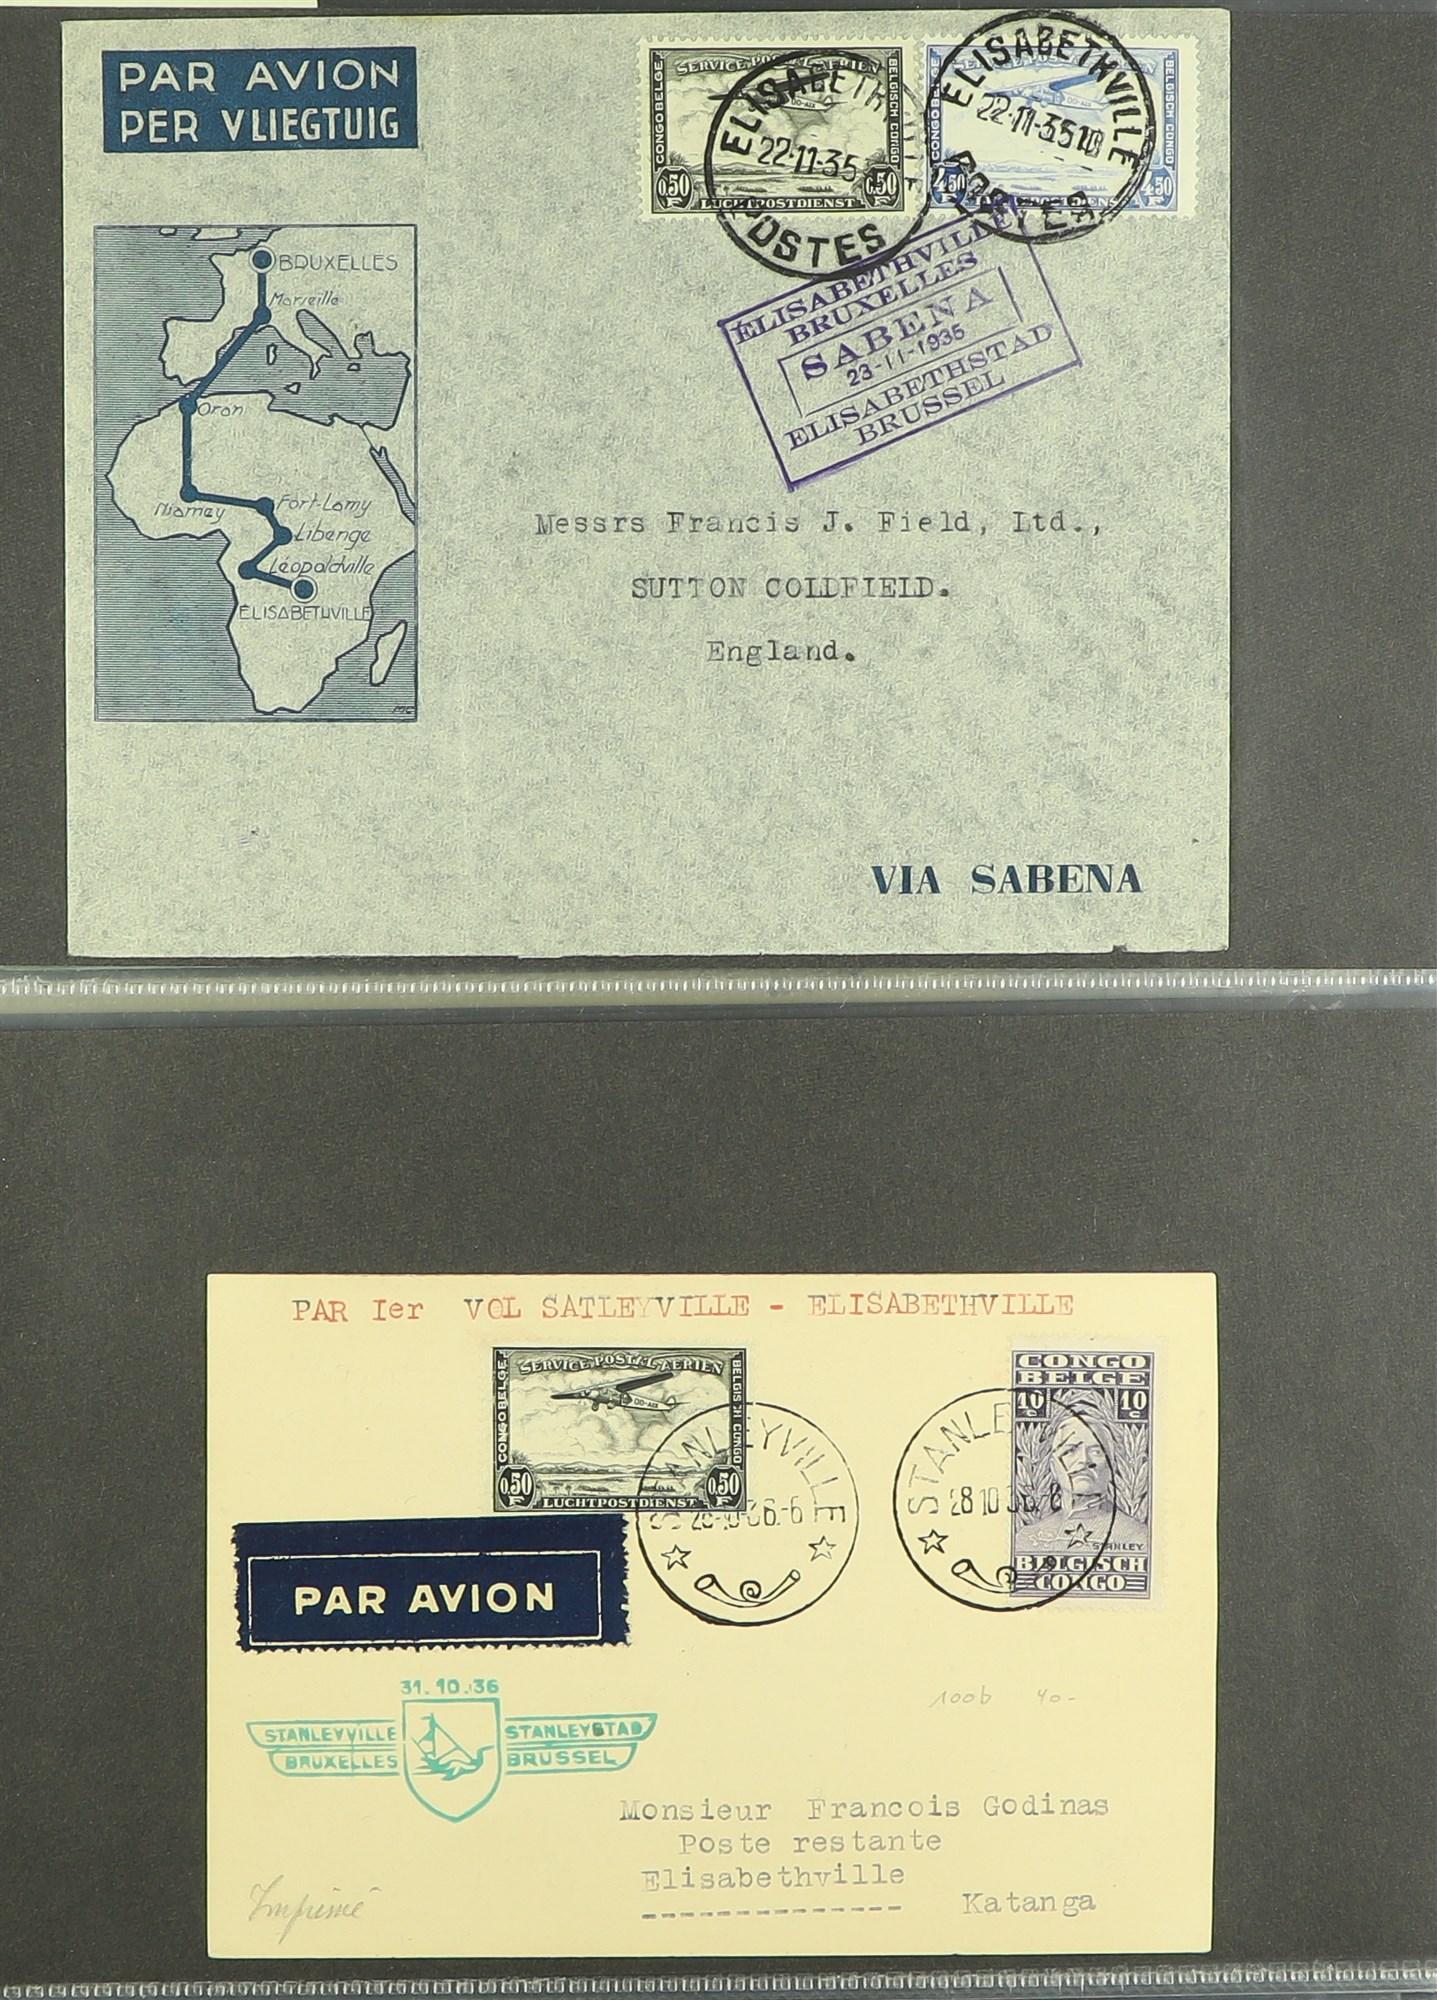 RHODESIA AIRMAIL COVERS COLLECTION 1930's-60's with Rhodesian & Nyasaland Airways (15), Nyasaland- - Image 8 of 10